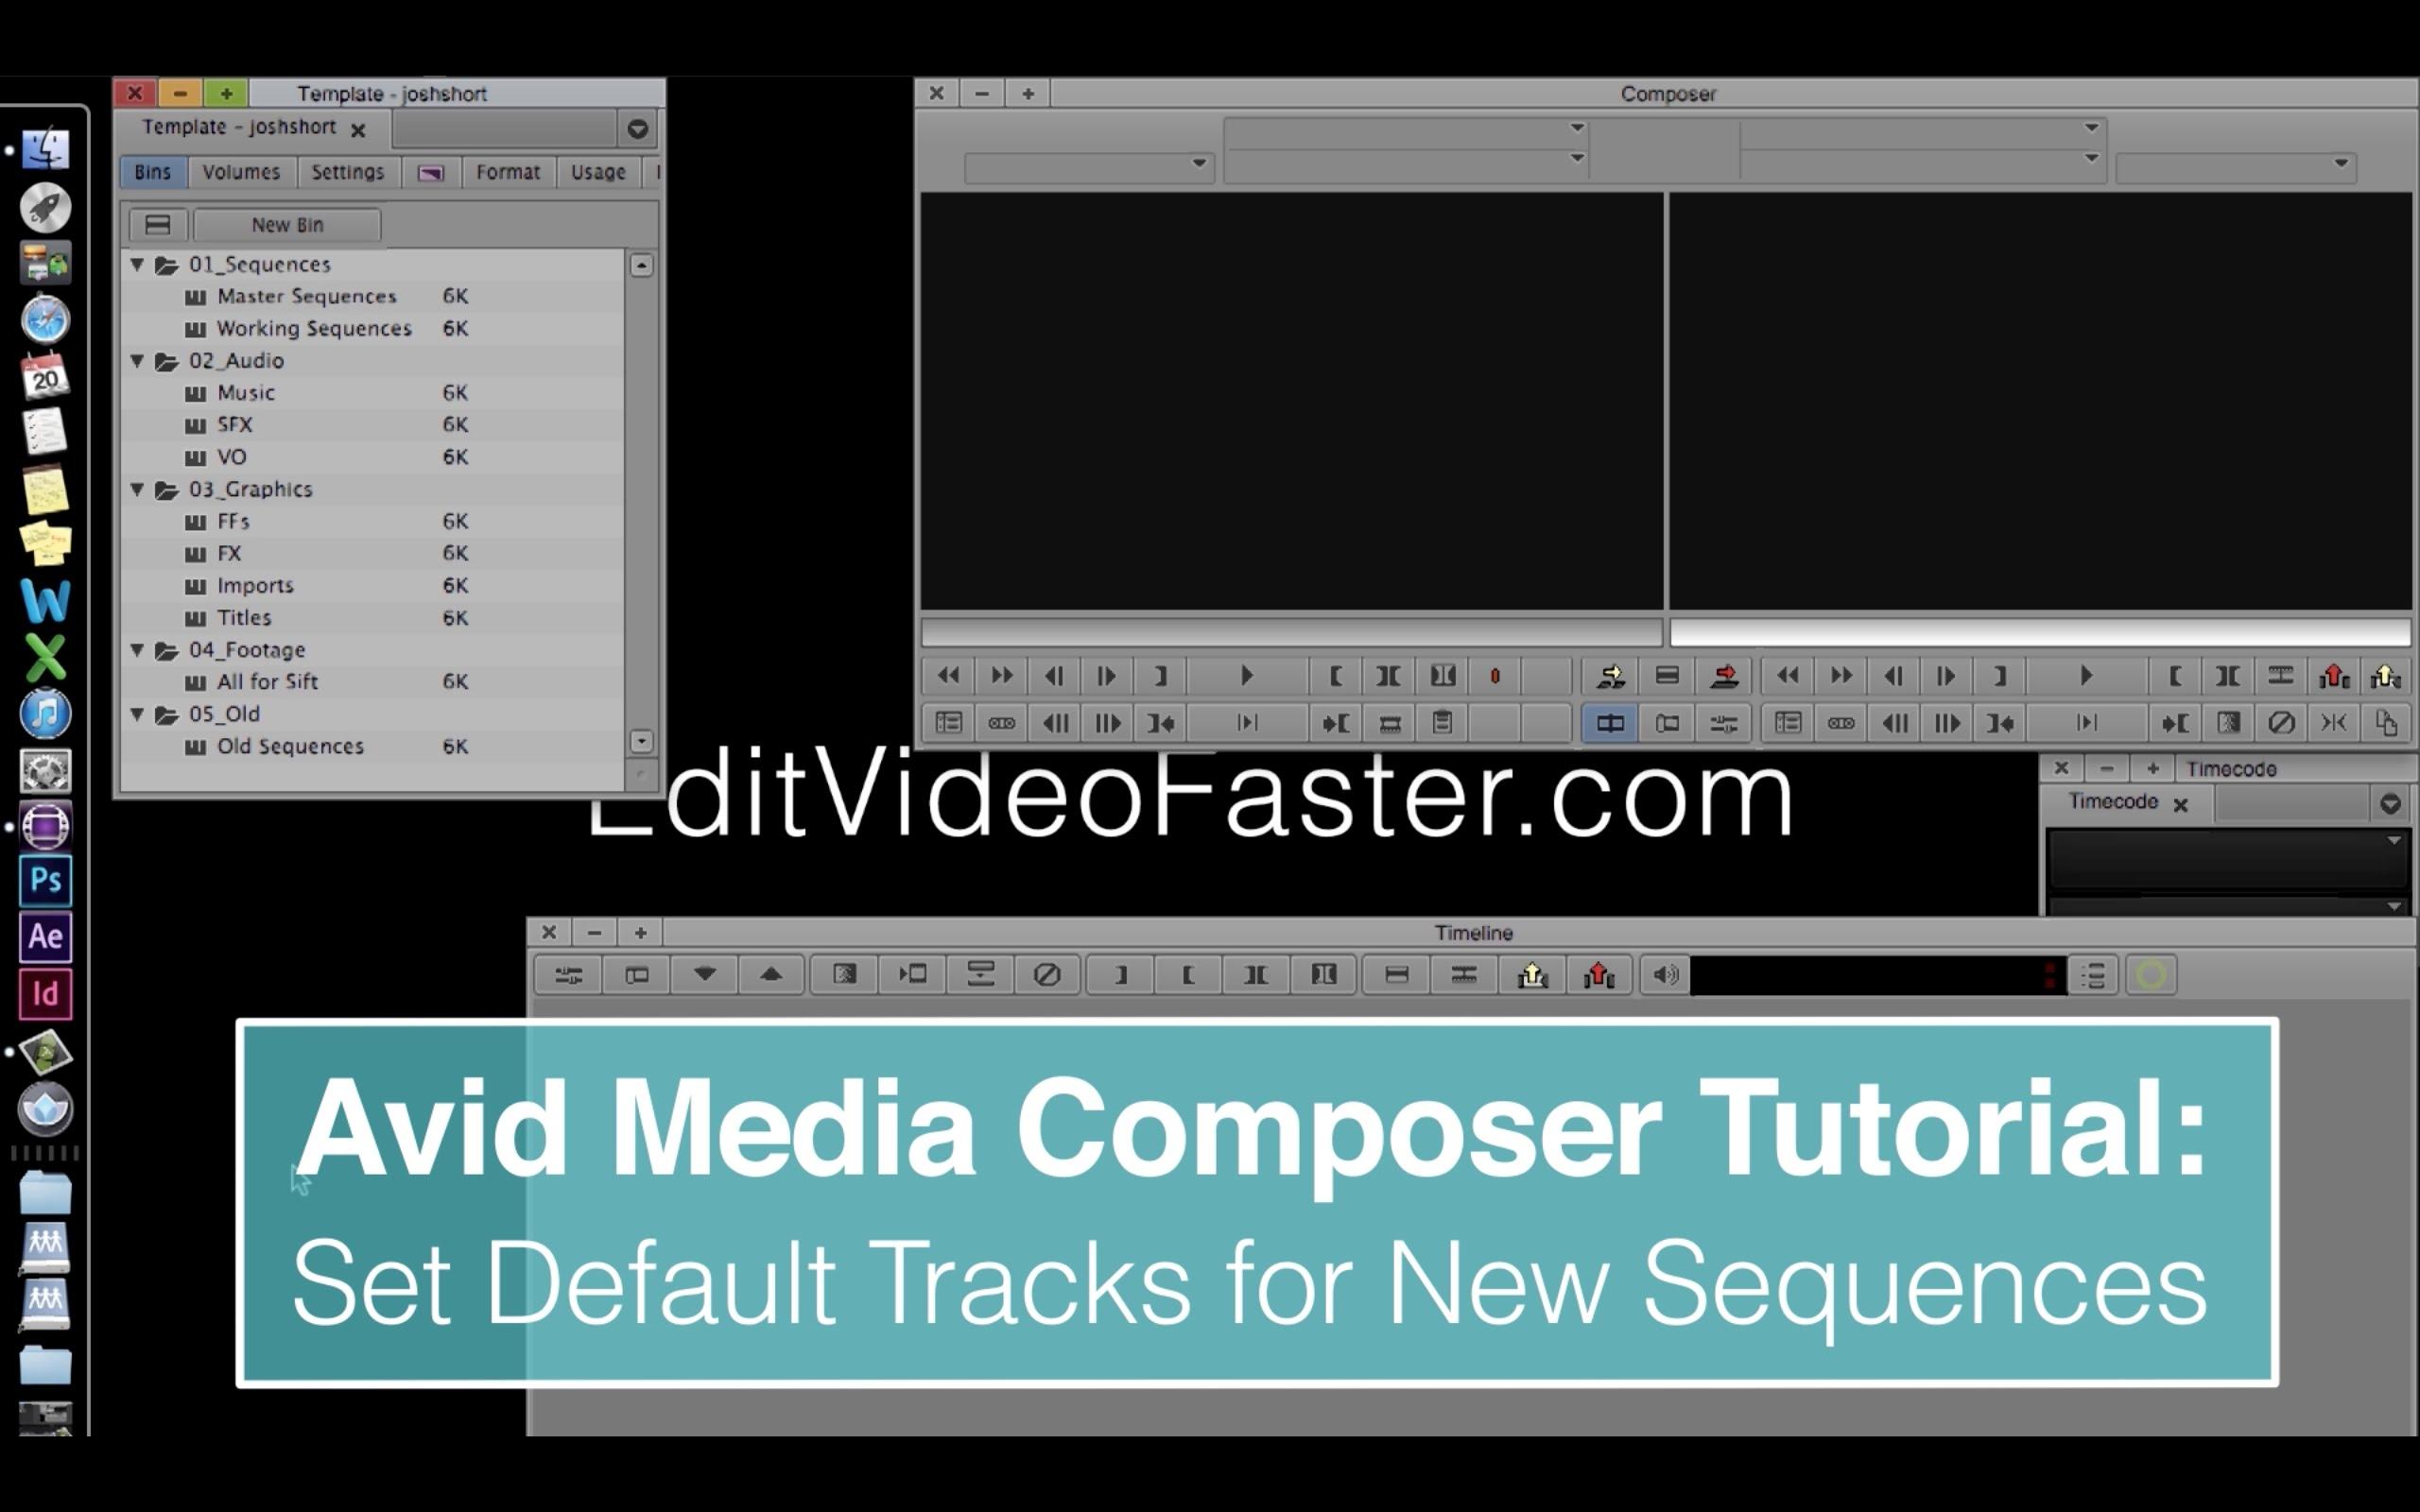 EVF Avid Media Composer Tutorial: Set Default Tracks in New Sequences